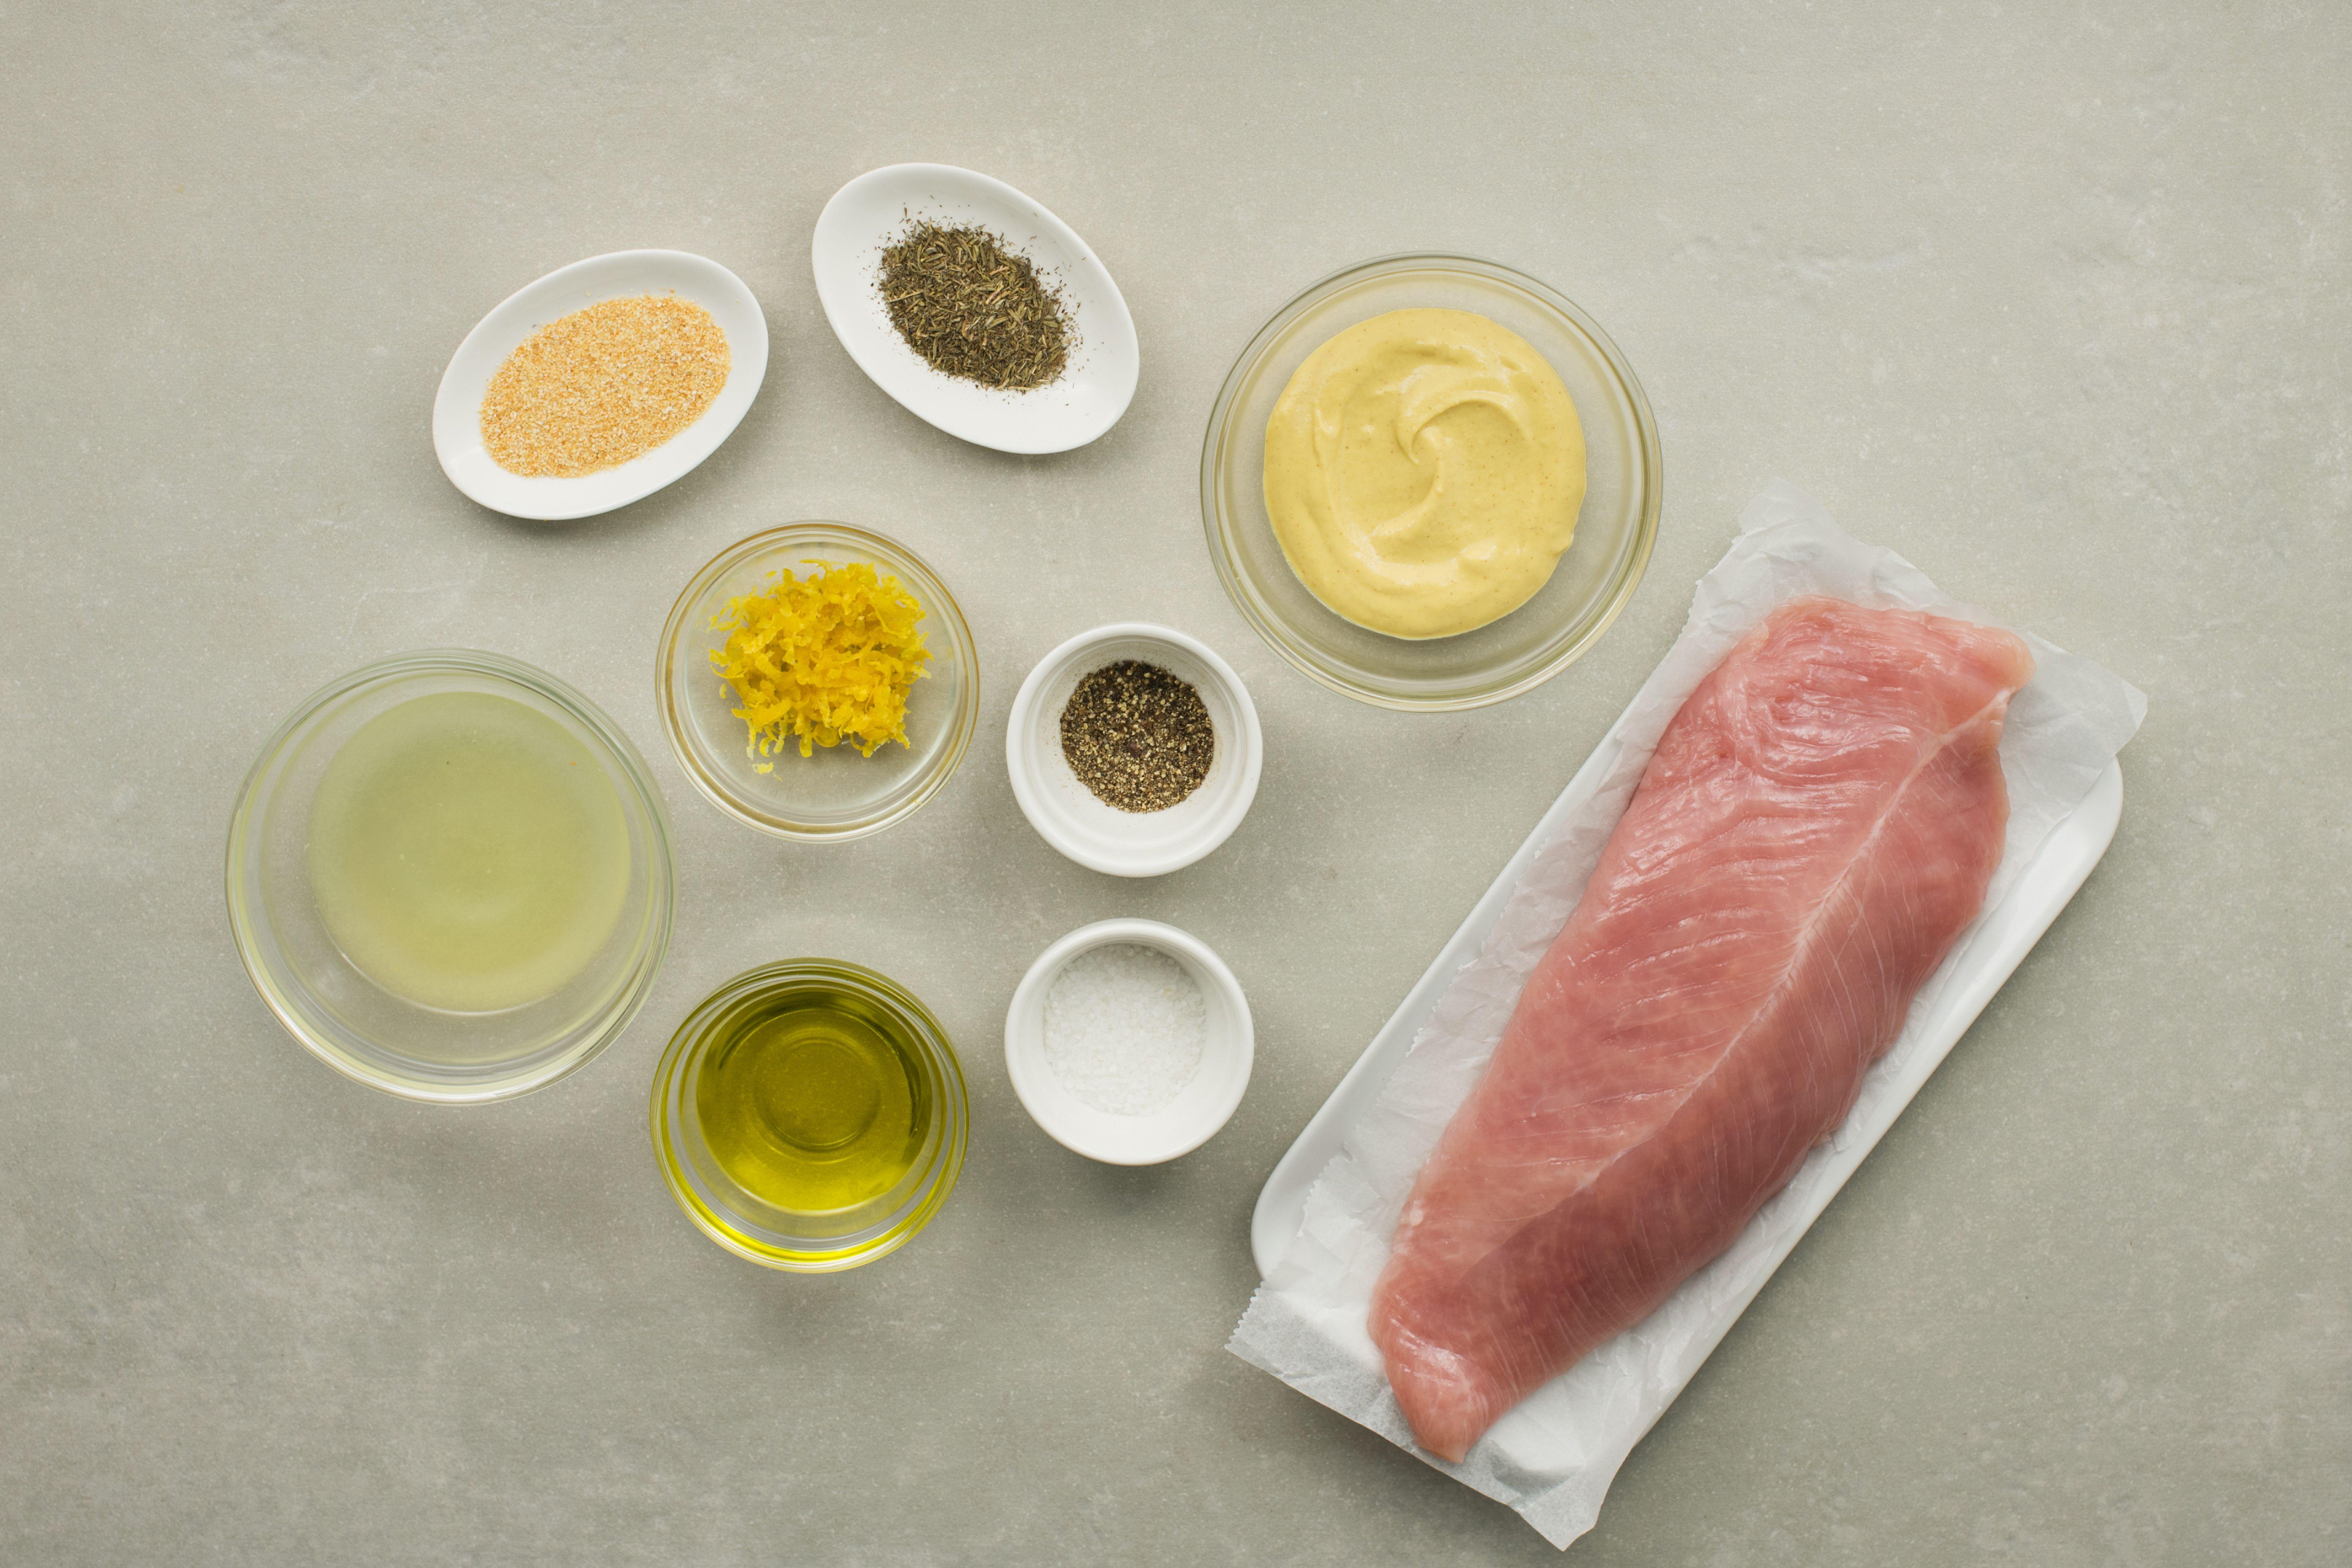 Ingredients for lemon turkey tenderloin